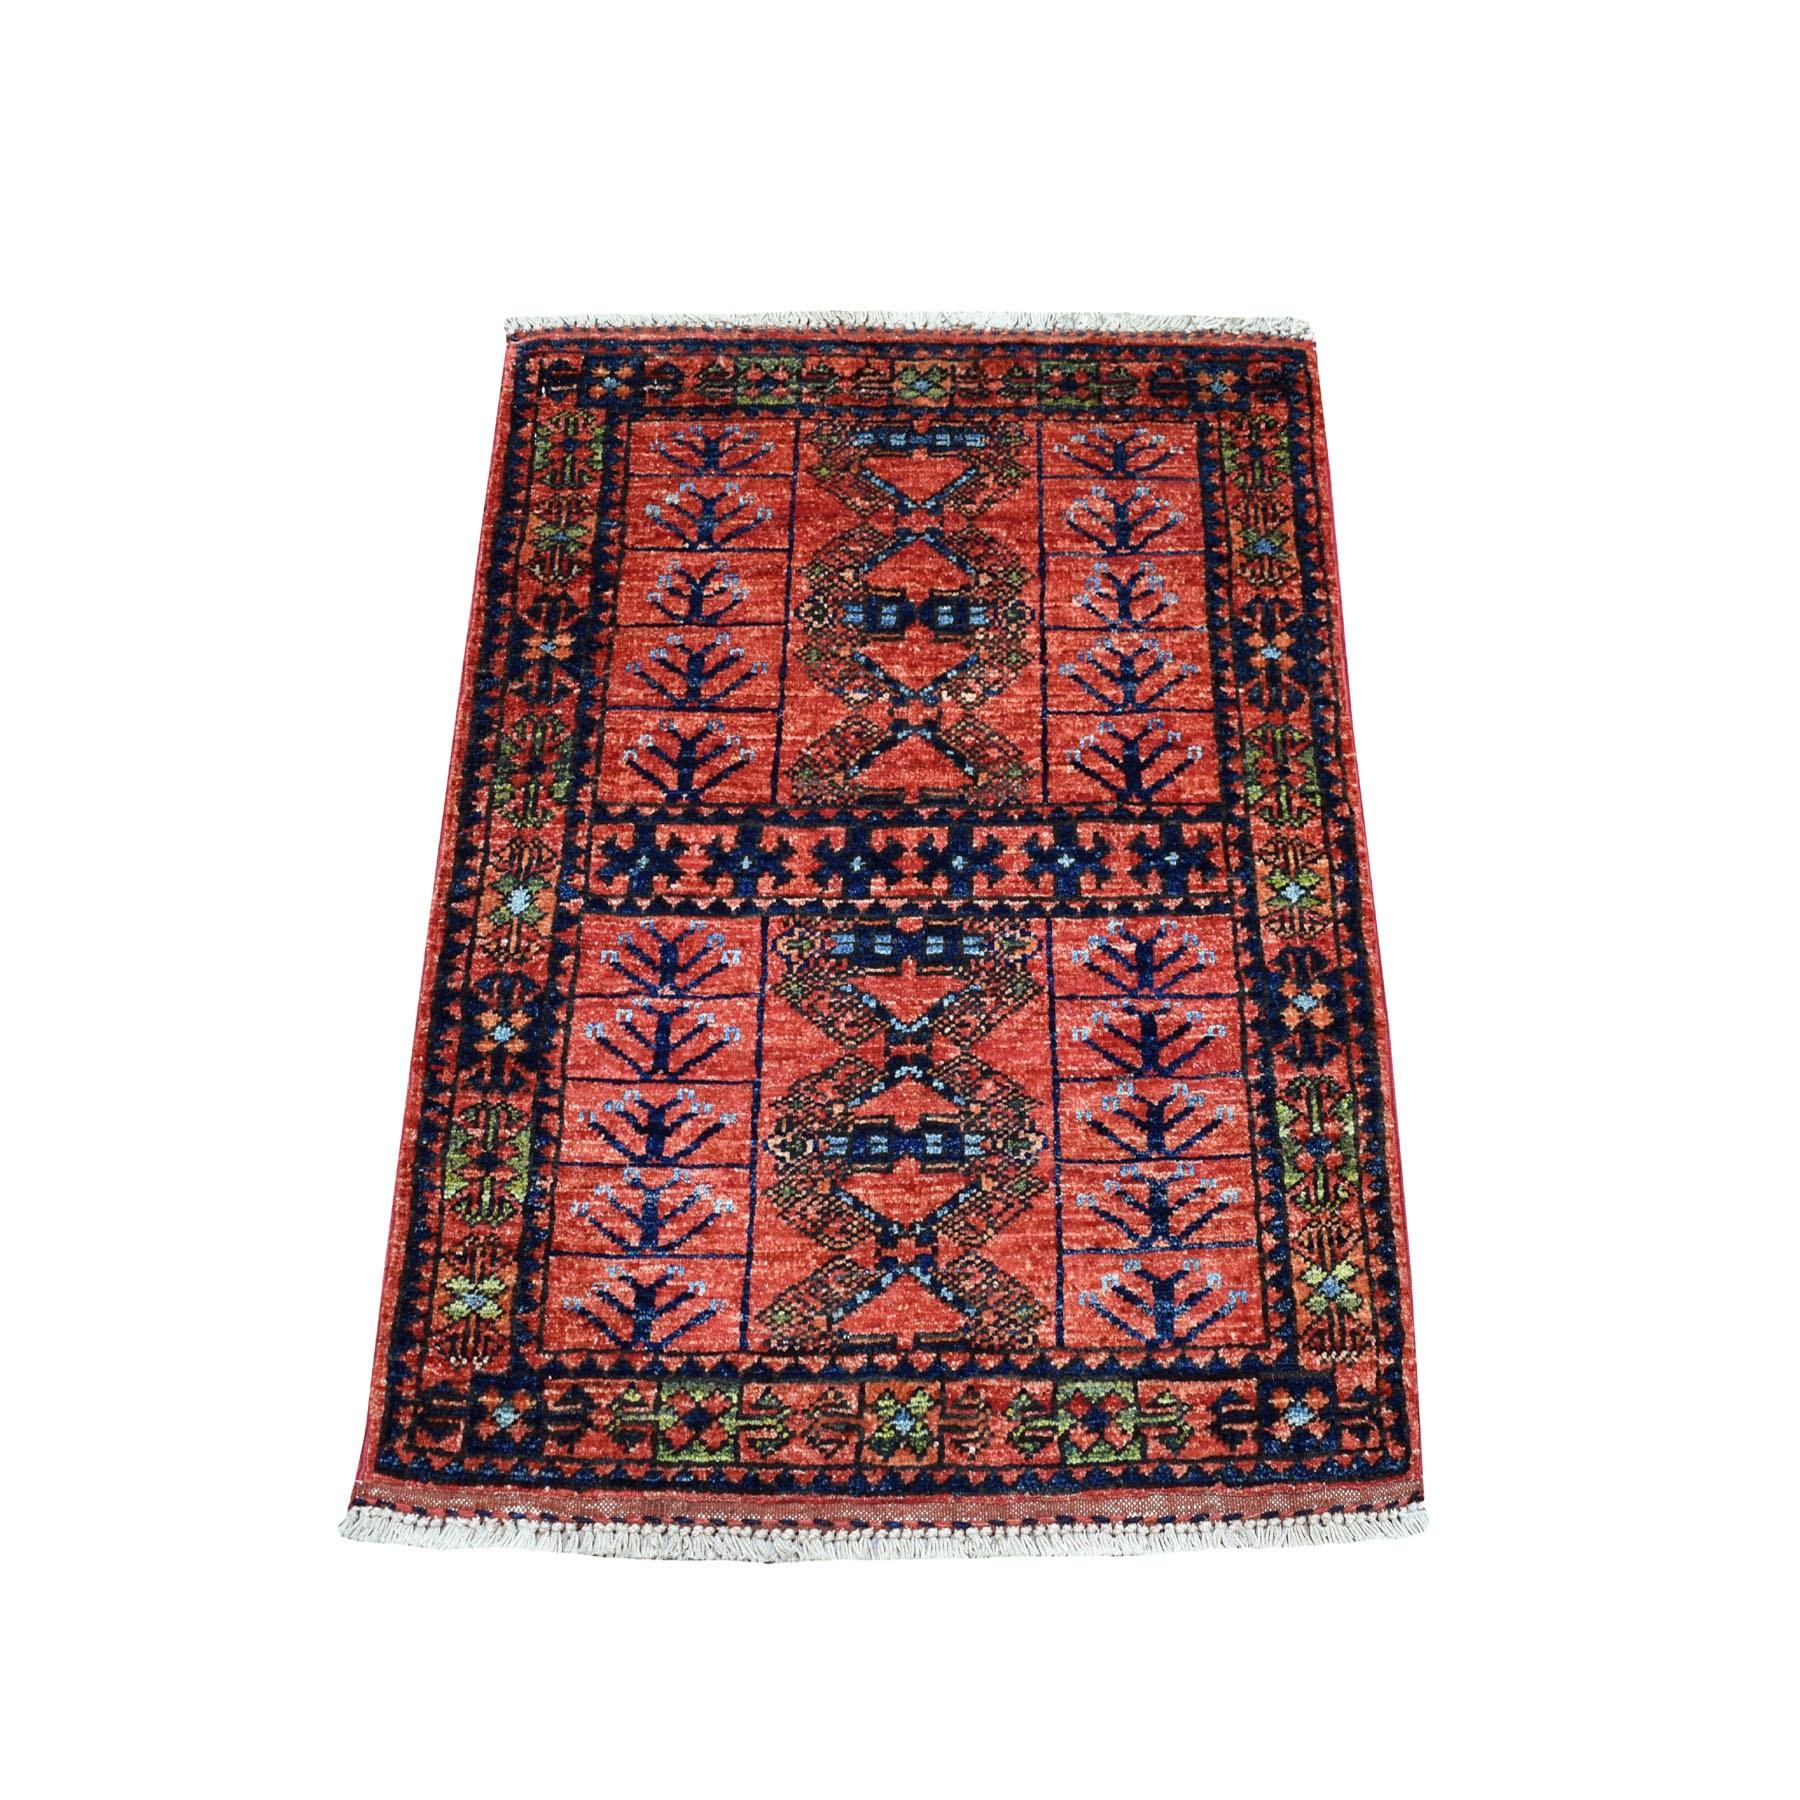 "2'2""X3' Red Afghan Ersari Geometric Design Hand Knotted Pure Wool Oriental Rug moaecbcc"